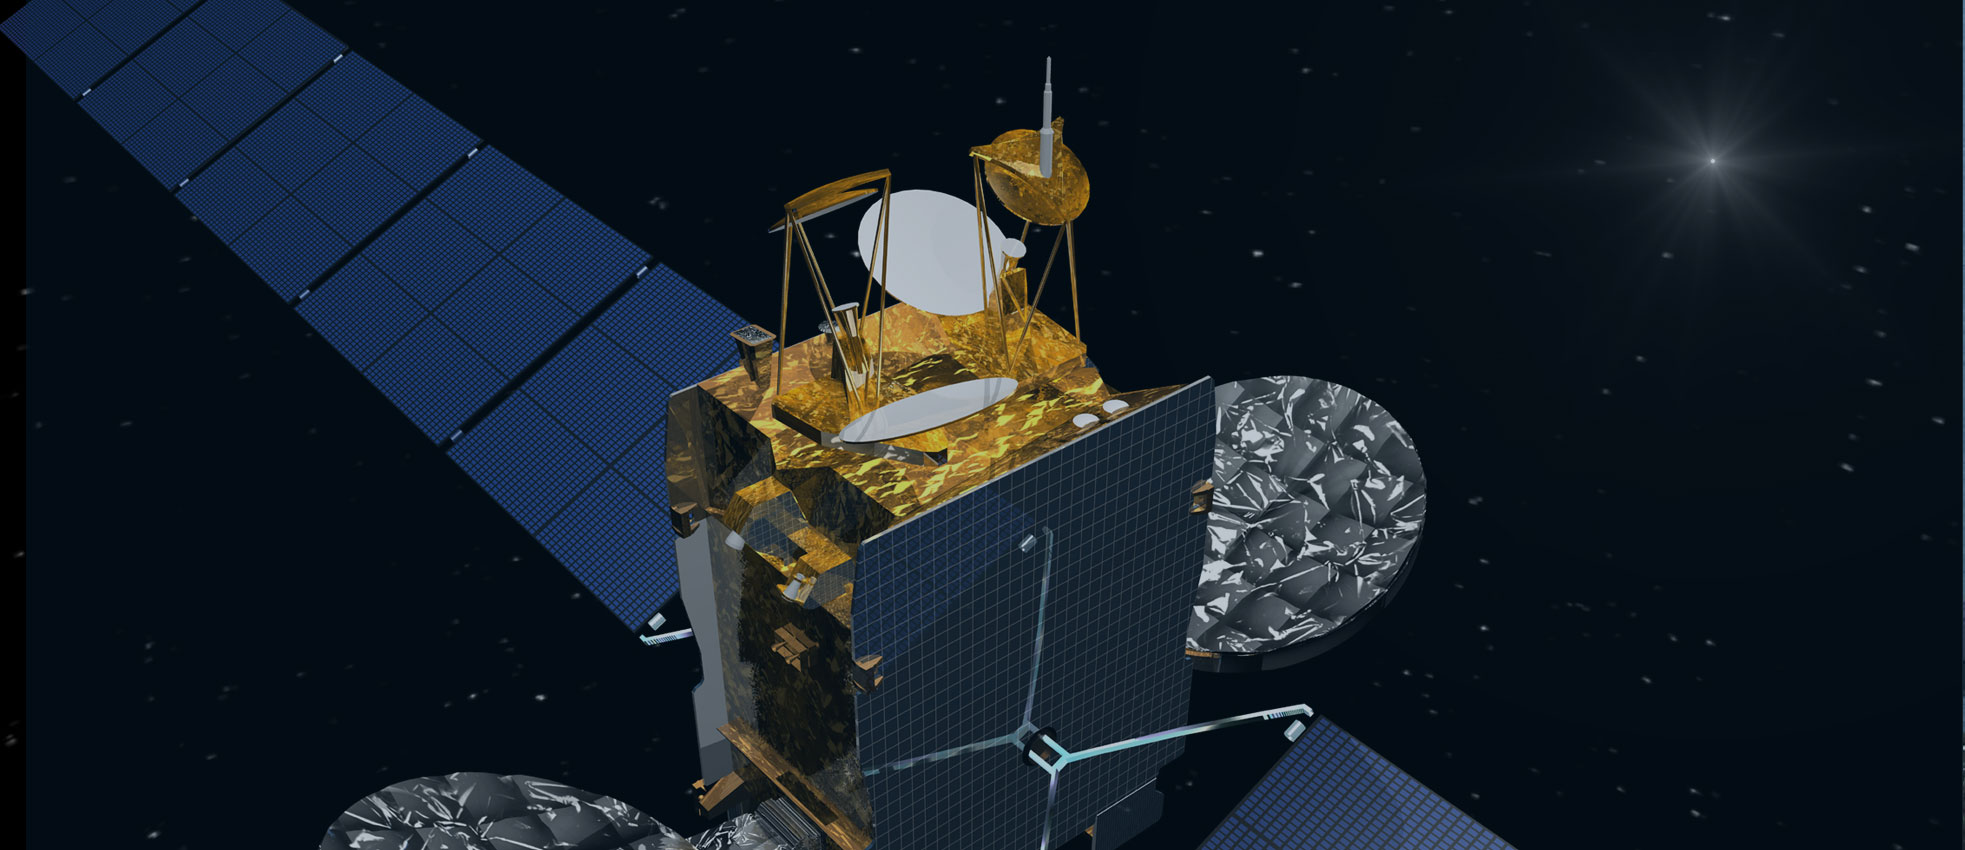 Eutelsat hotbird 13° ost senderliste